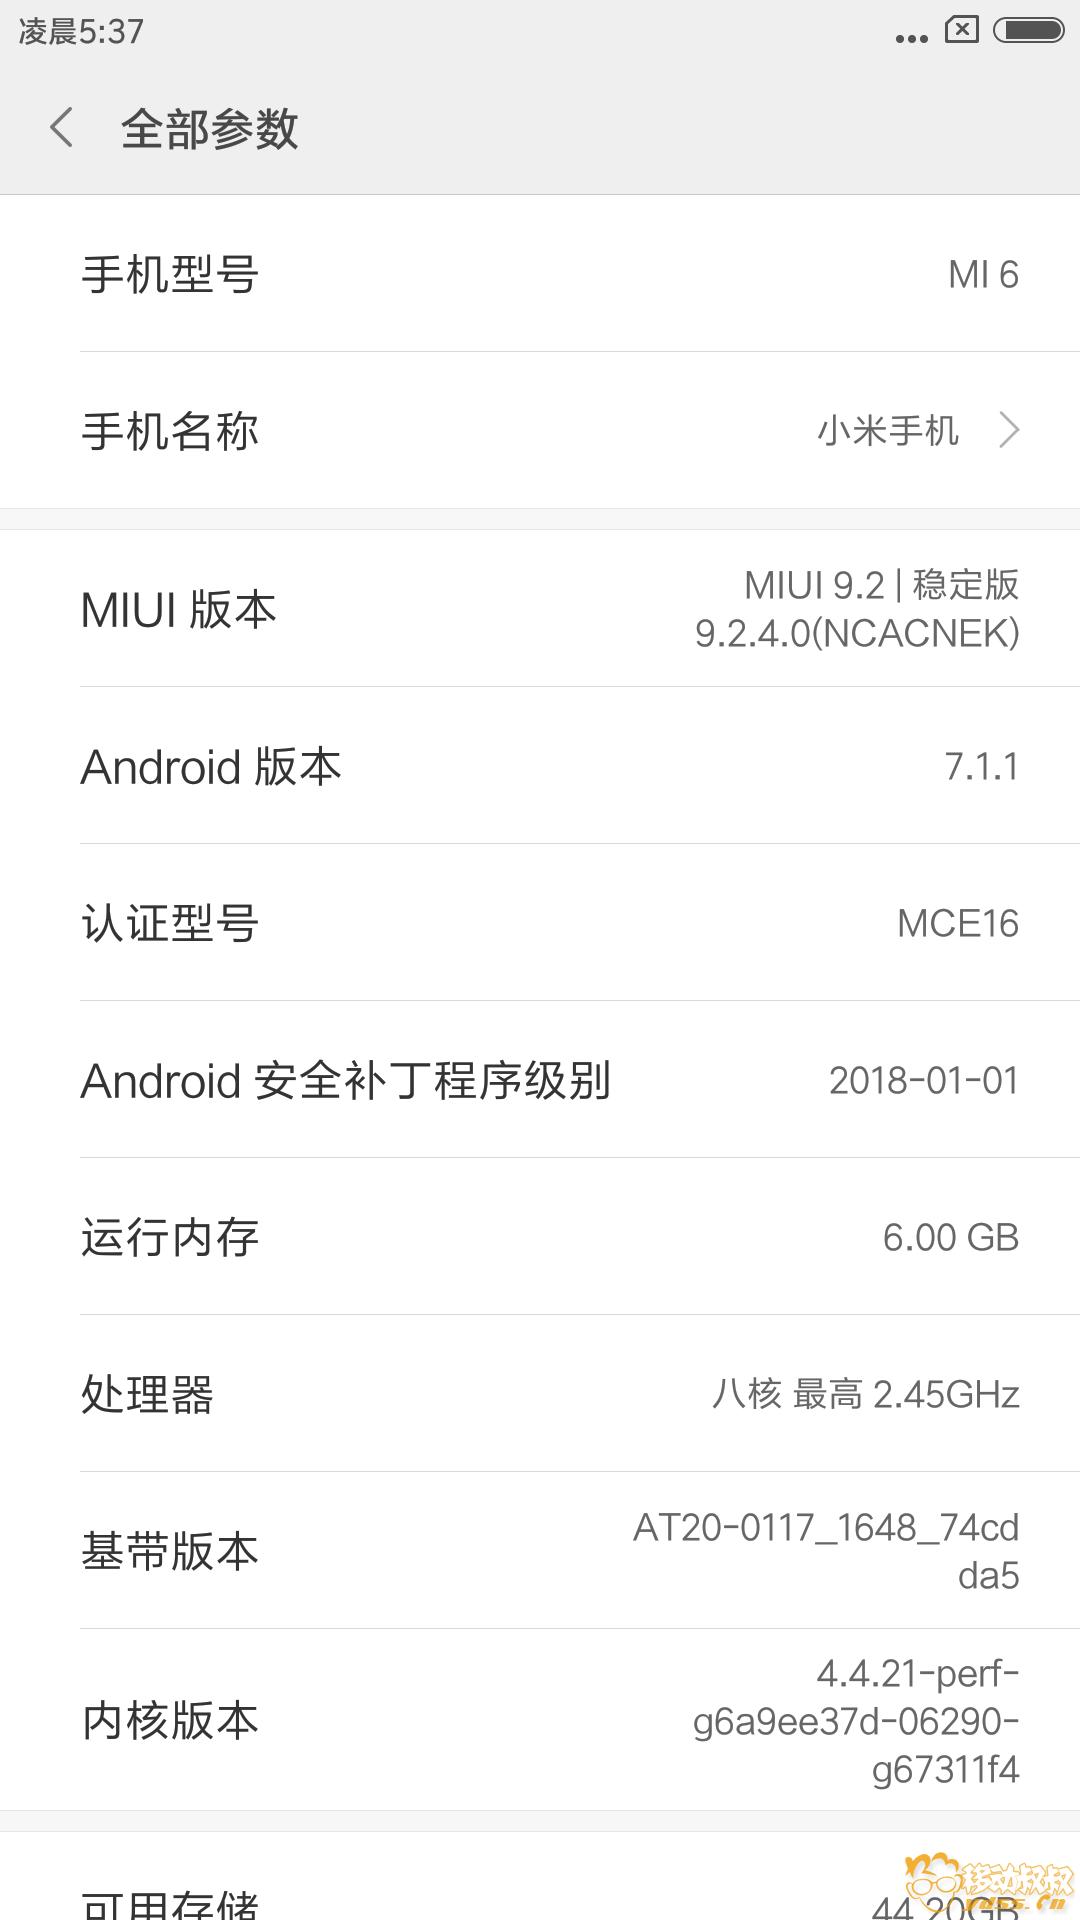 Screenshot_1970-07-28-05-37-49-093_com.android.settings.png